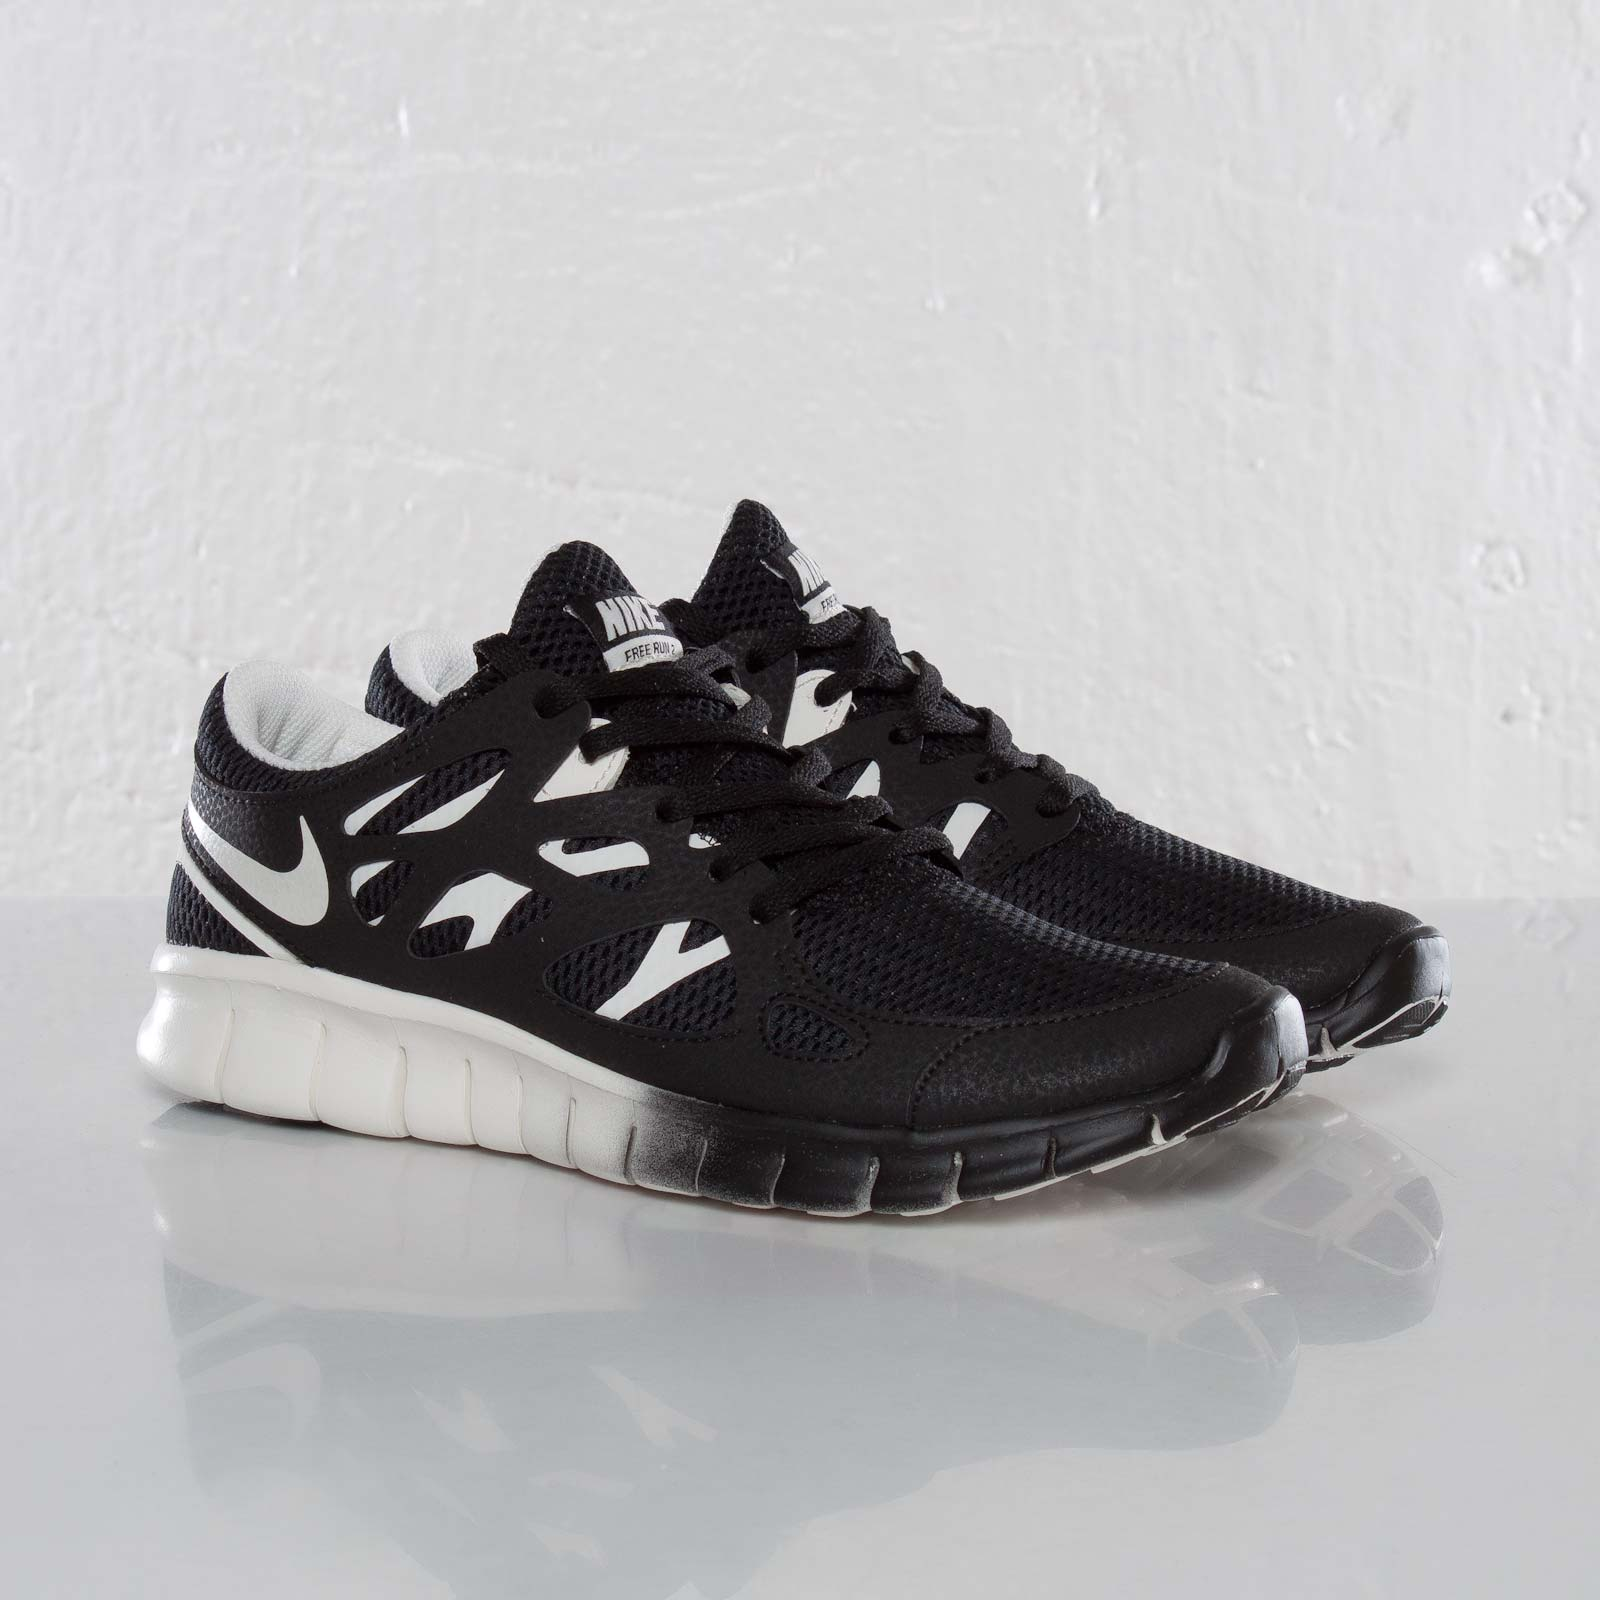 79407c6bb144 Nike Wmns Free Run 2 EXT - 536746-004 - Sneakersnstuff